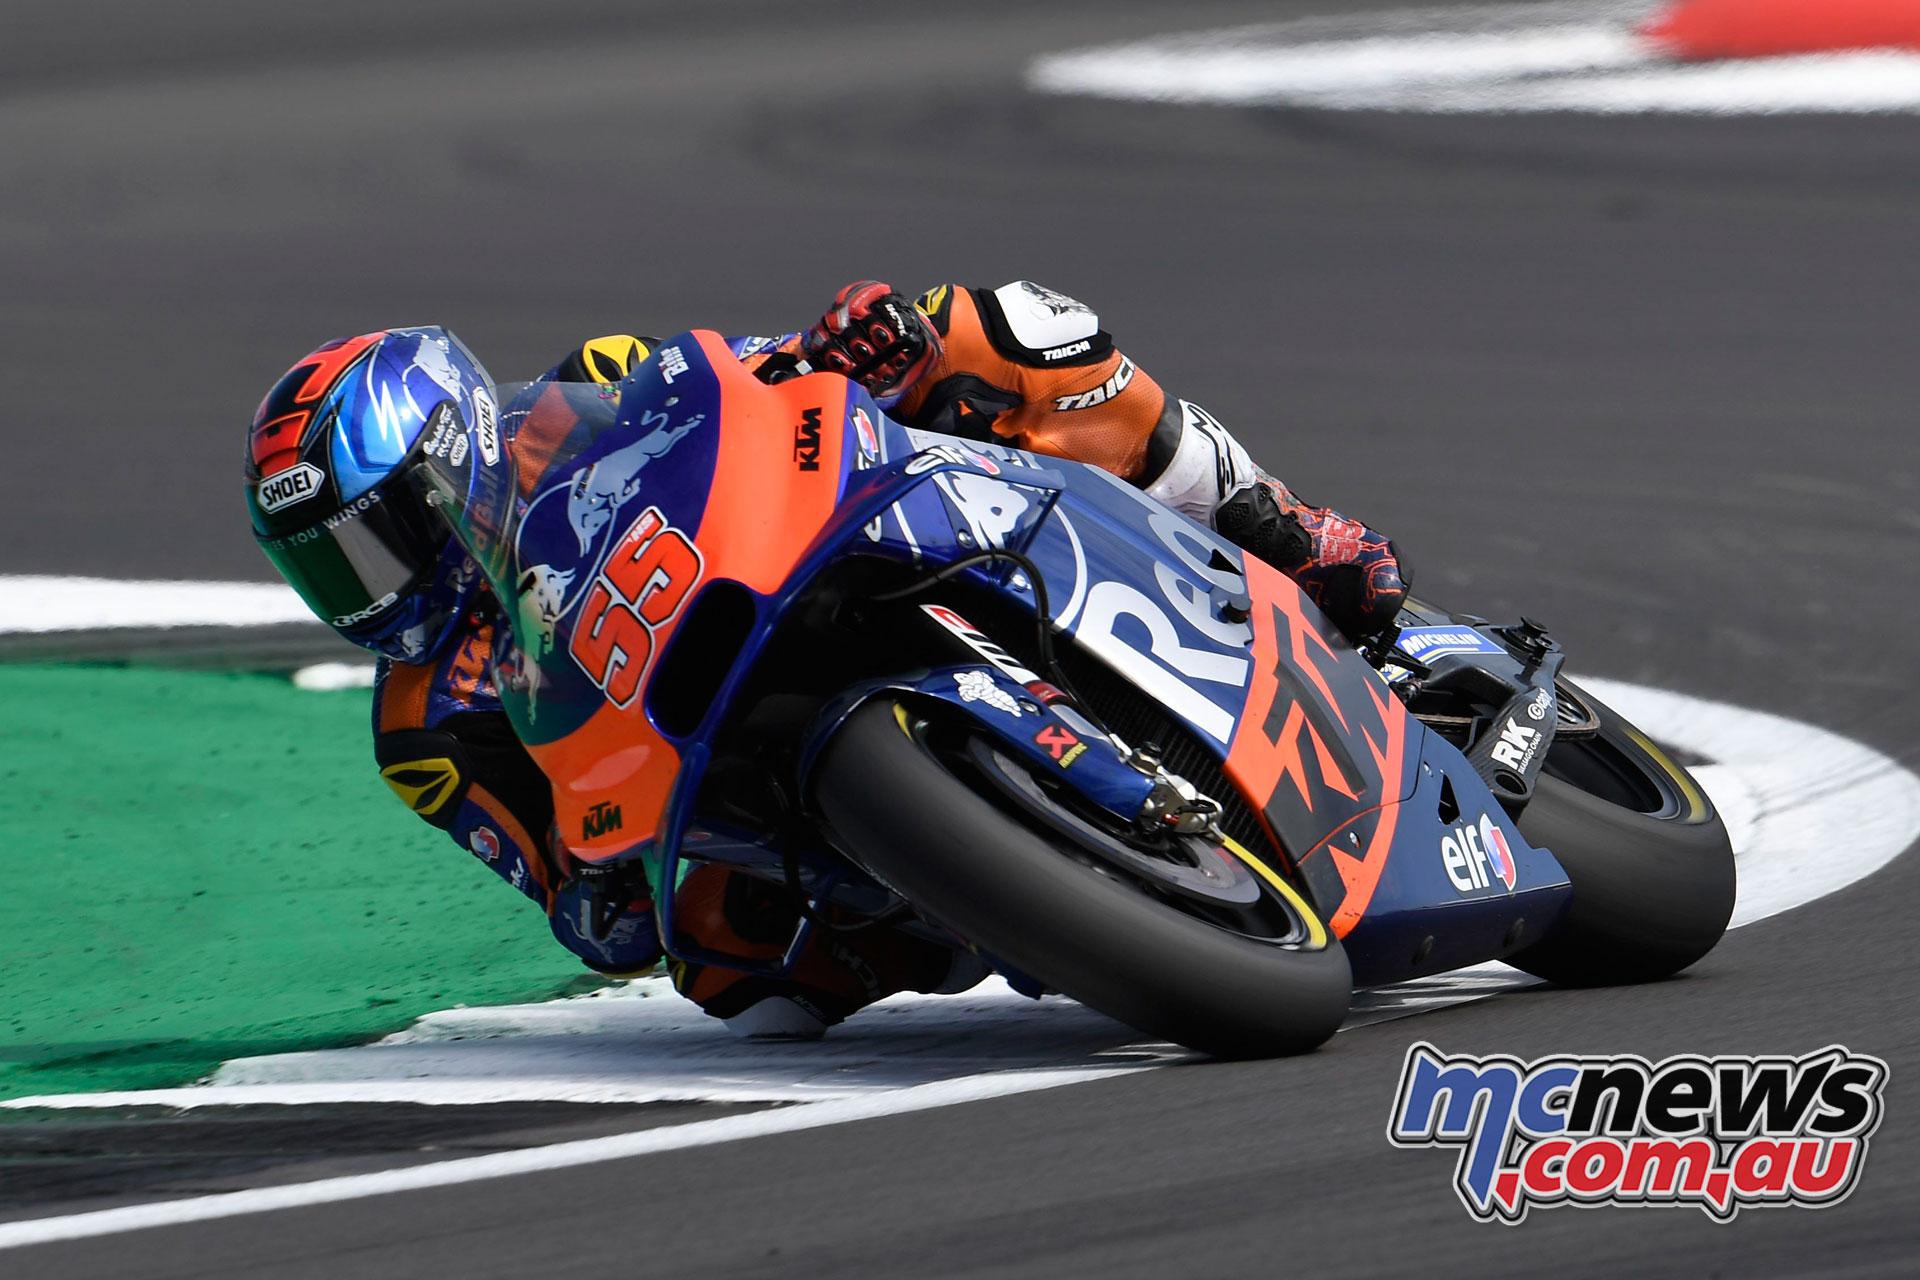 MotoGP Rnd Silverstone Hafizh Syahrin